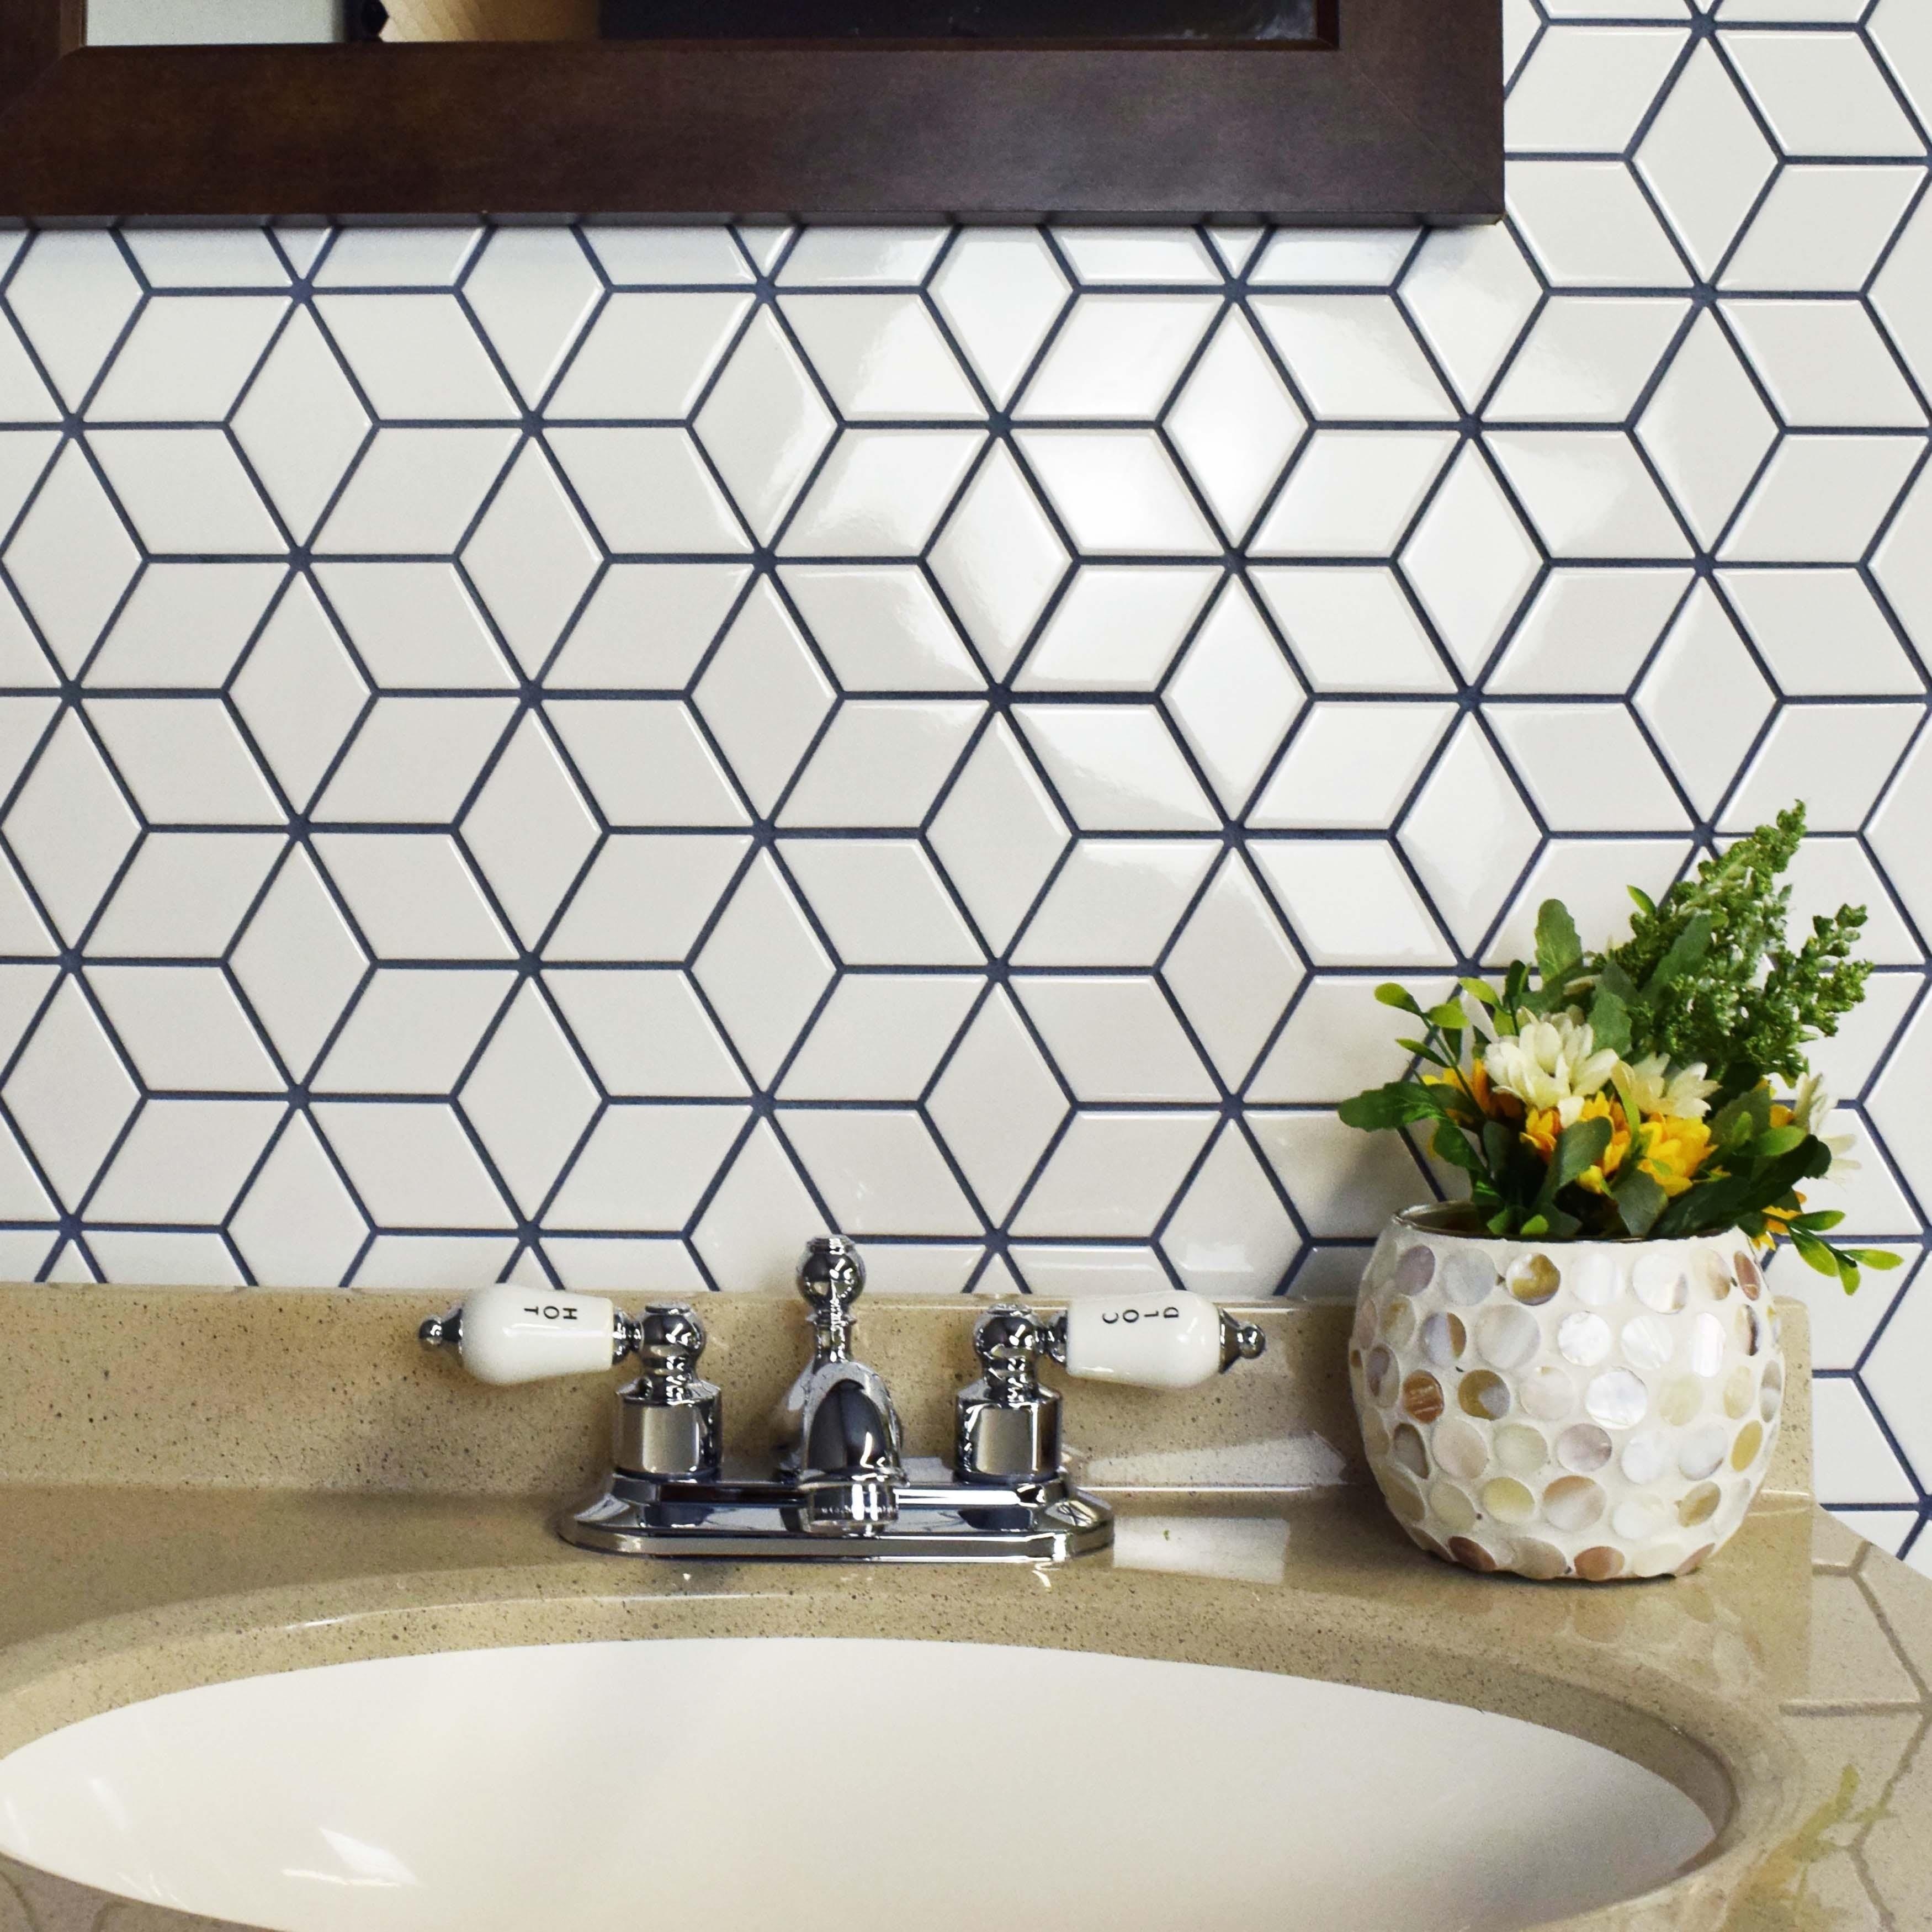 - Shop SomerTile 10.5x12.125-inch Victorian Rhombus Glossy White